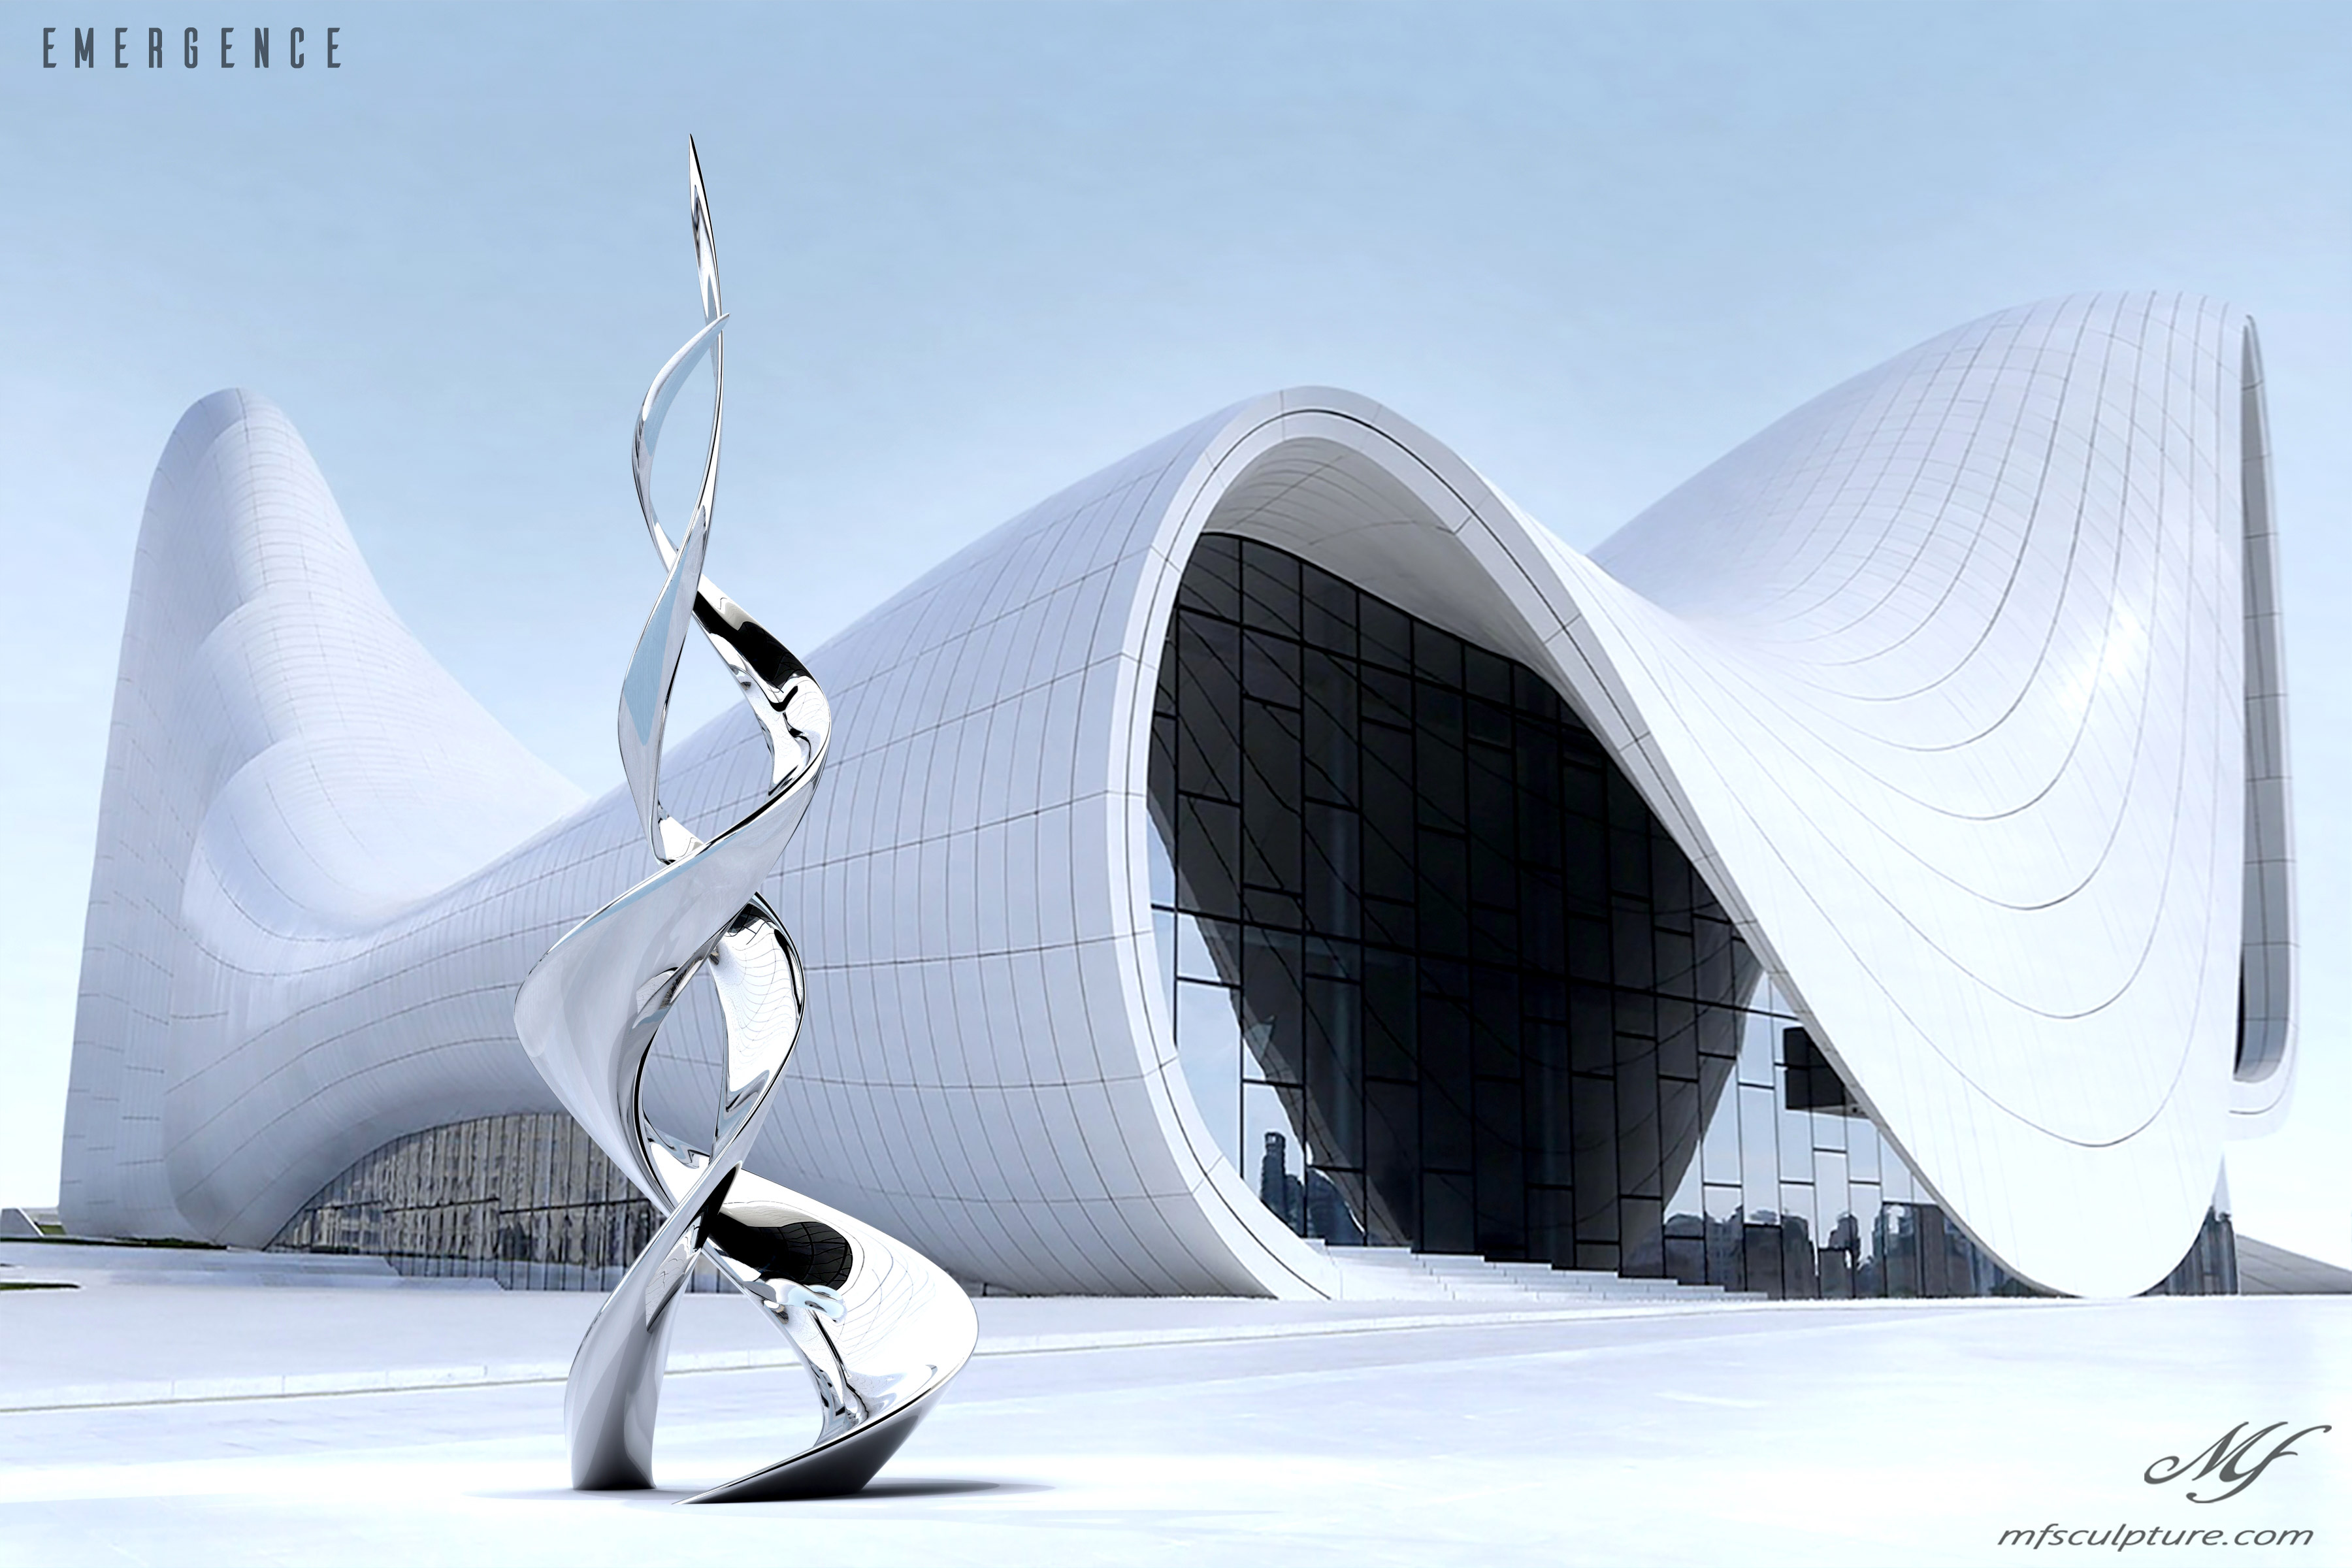 Heydar aliyev center baku zaha hadid Unity Modern Sculpture Emergence Monument 4